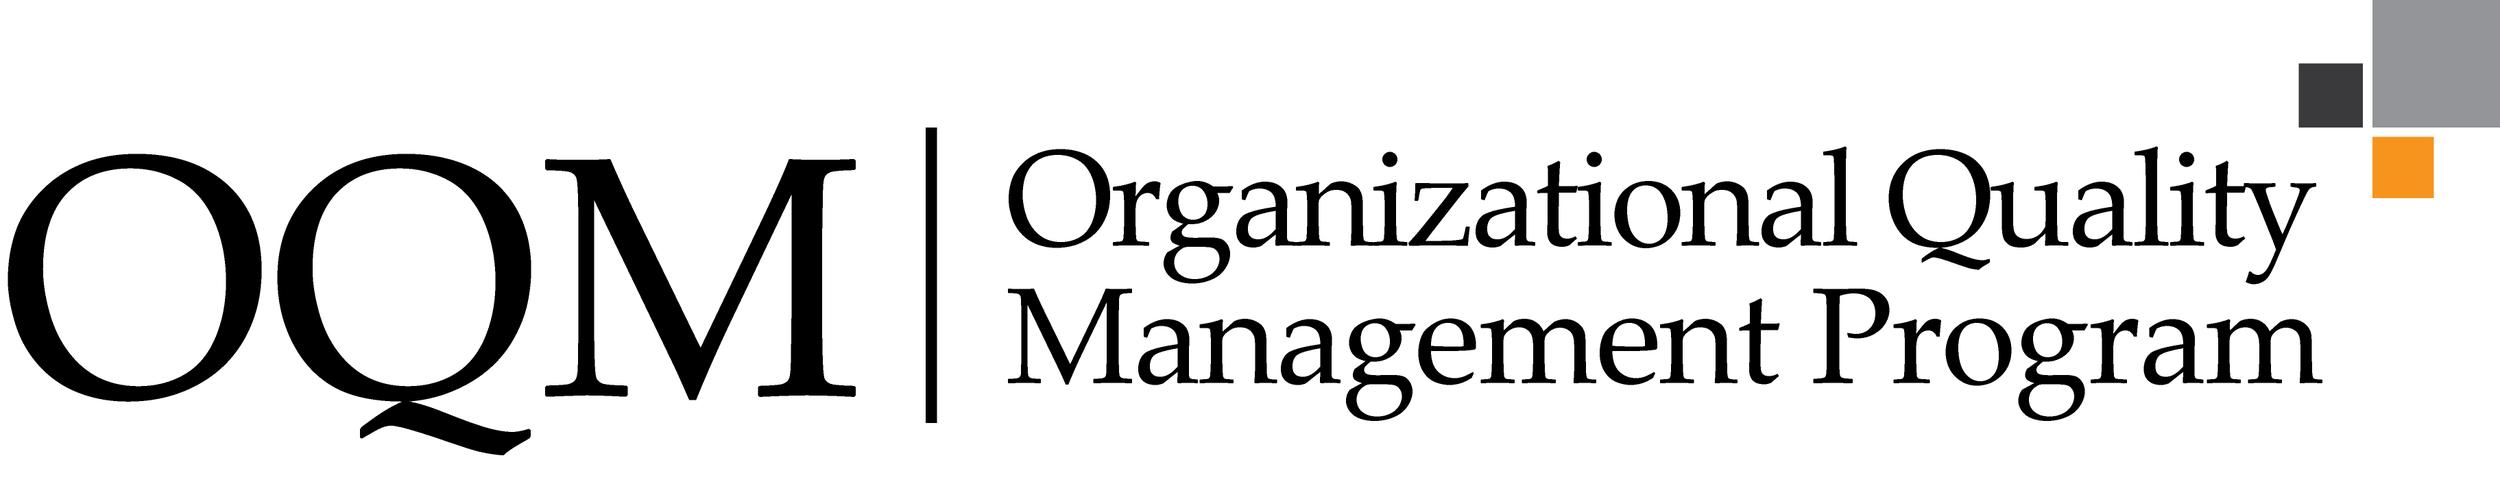 OQM Certified